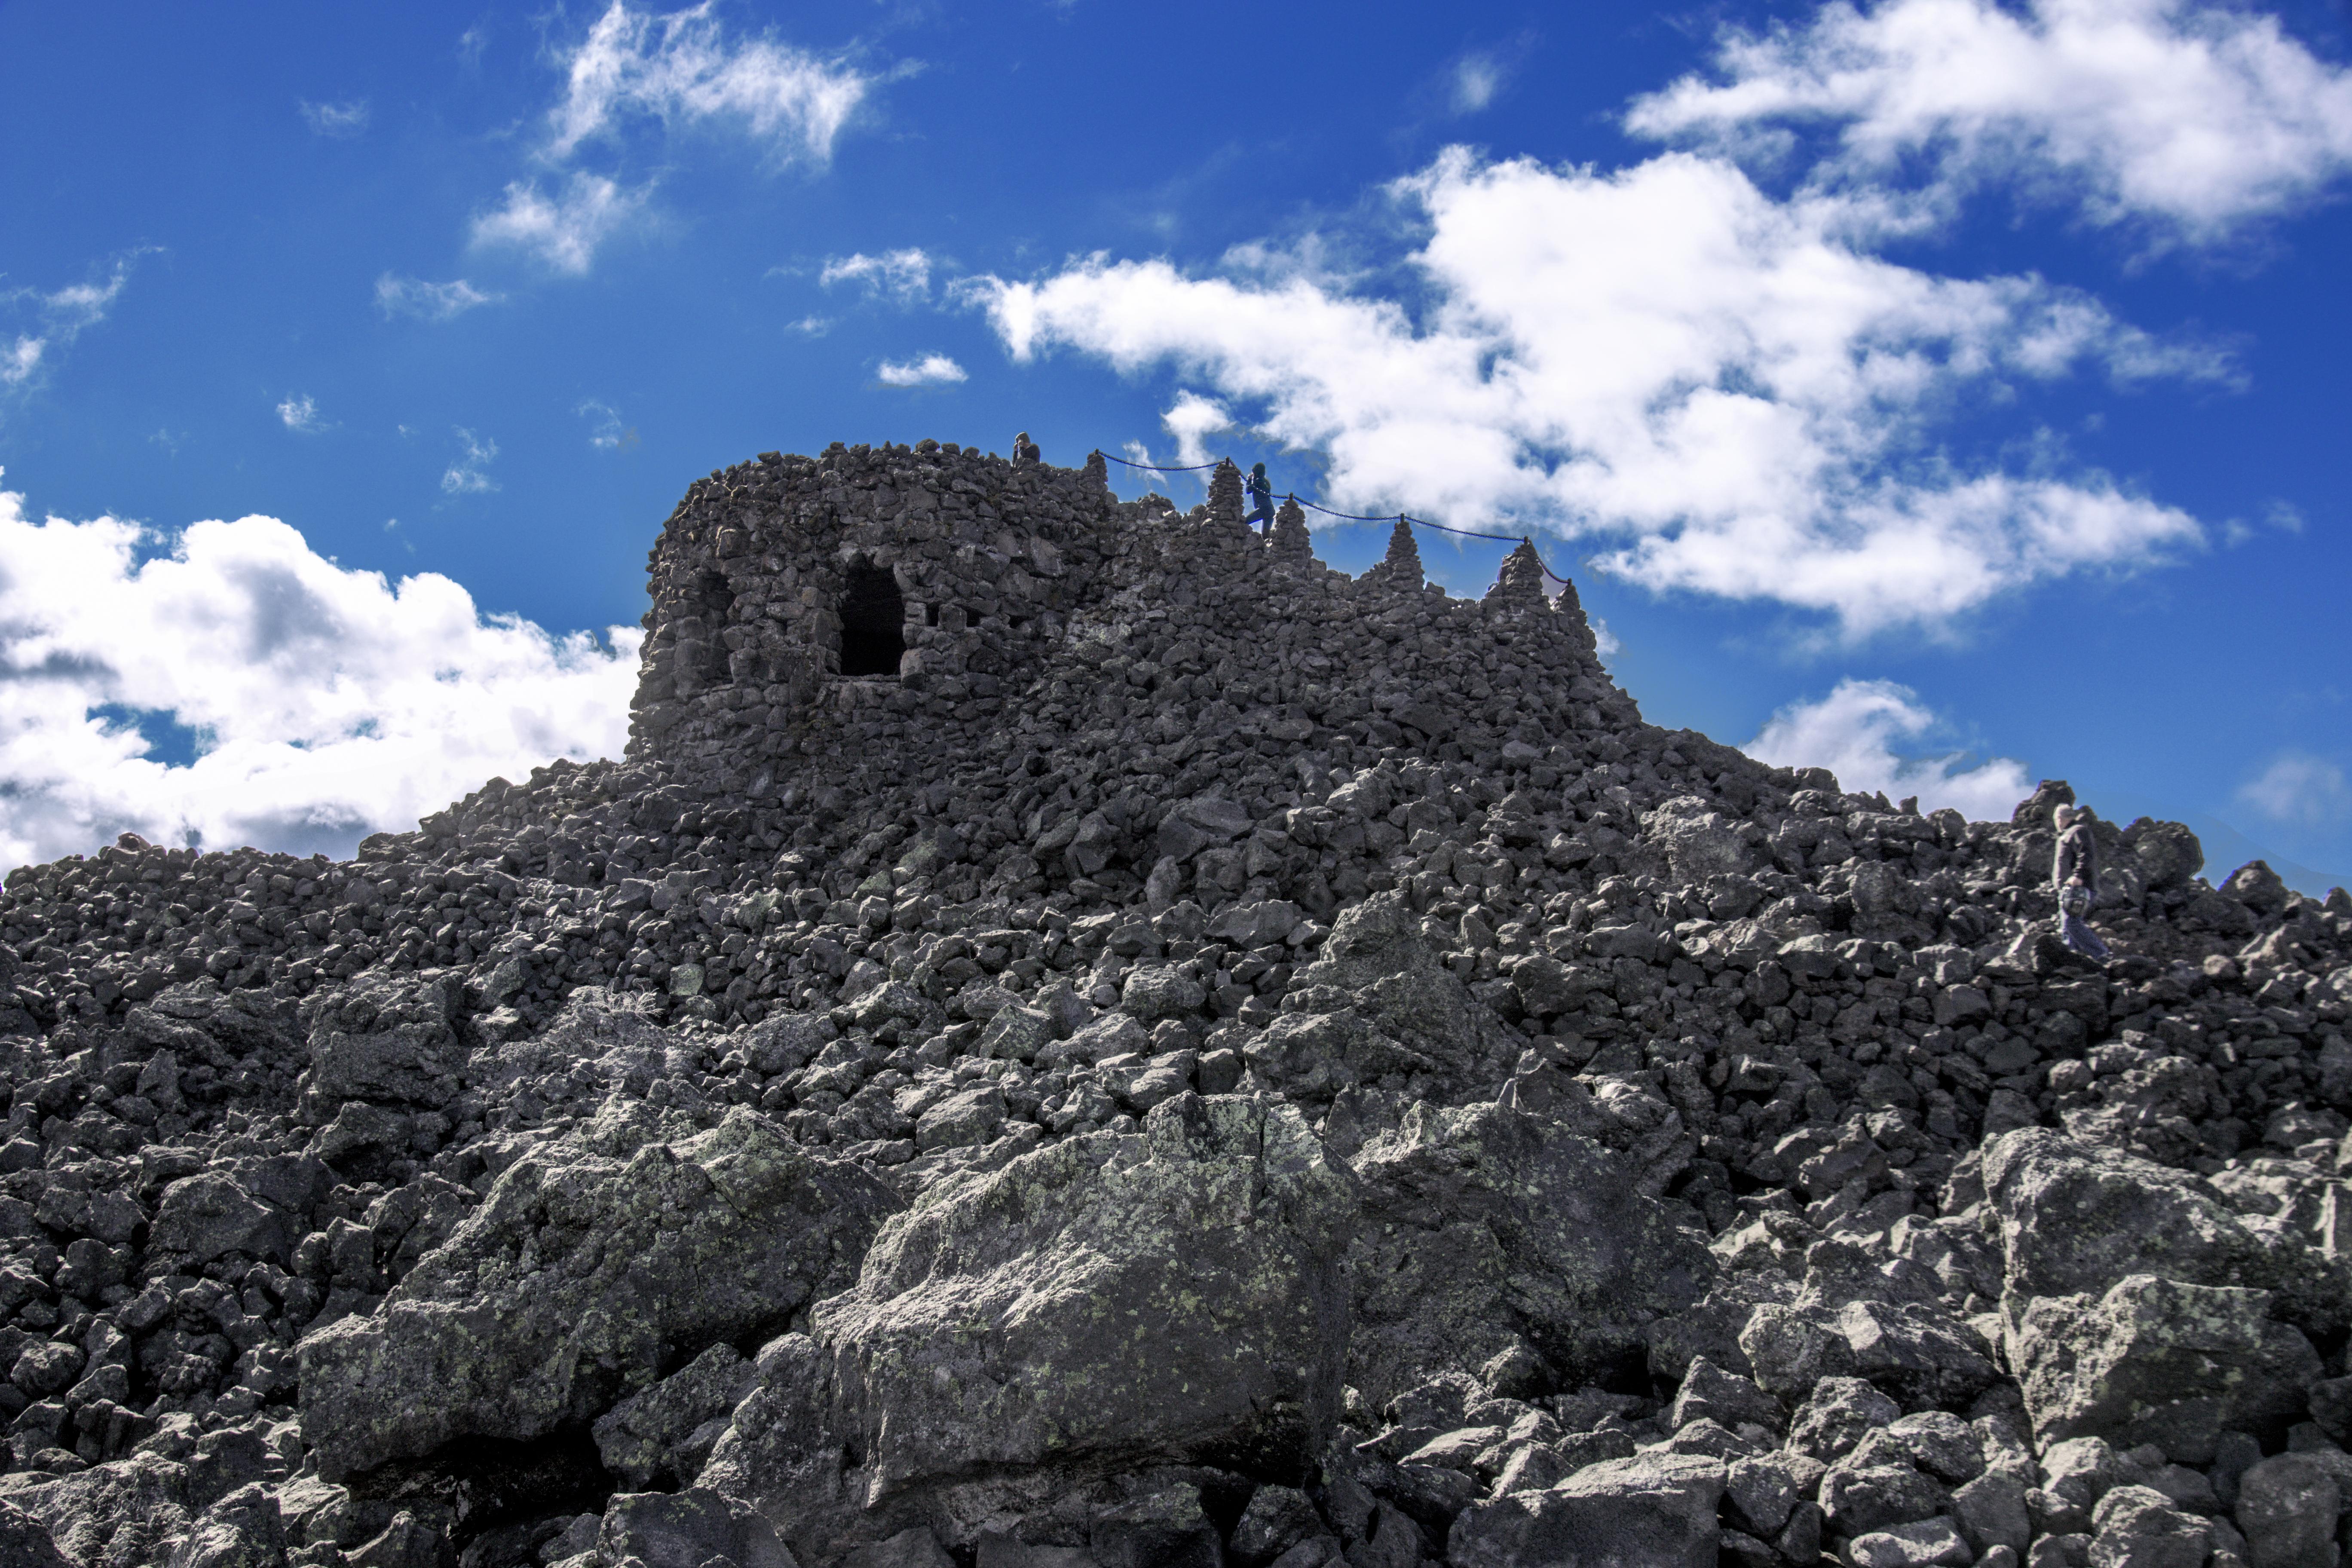 Dee Wright Observatory, Oregon, lava rocks, Sky, Rock, Oregon, Mountainside, HQ Photo